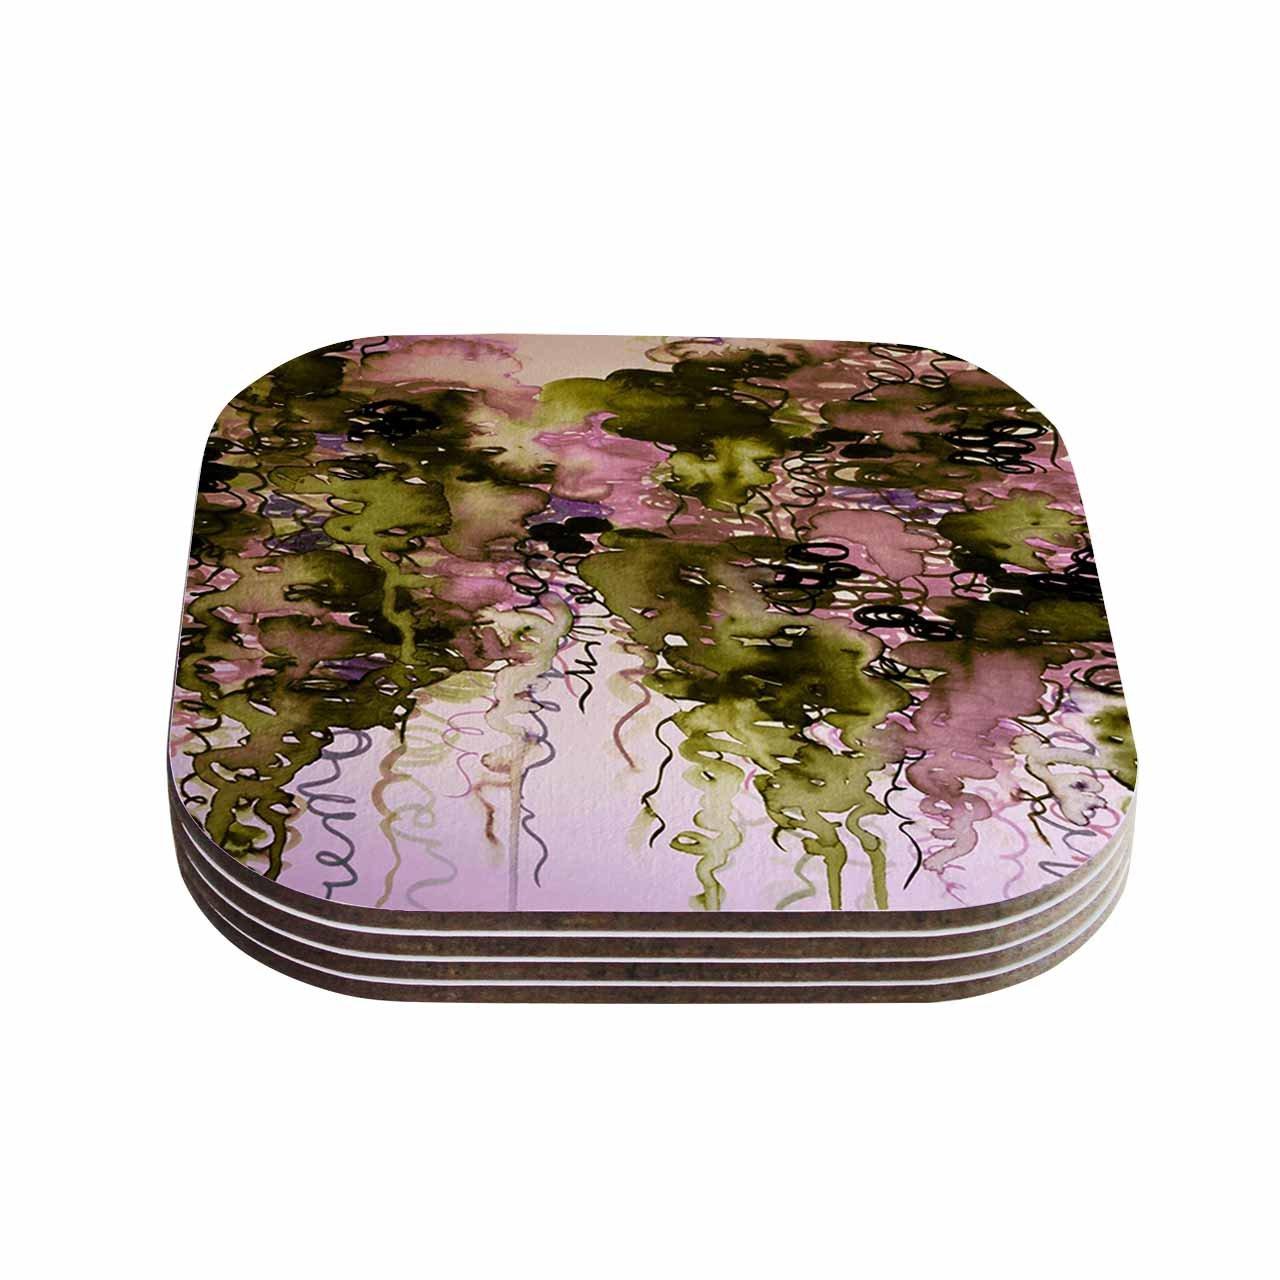 Set of 4 Olive Pink Green Lavender Coasters Multi KESS InHouse Ebi EmporiumBeauty In The Rain 4 x 4